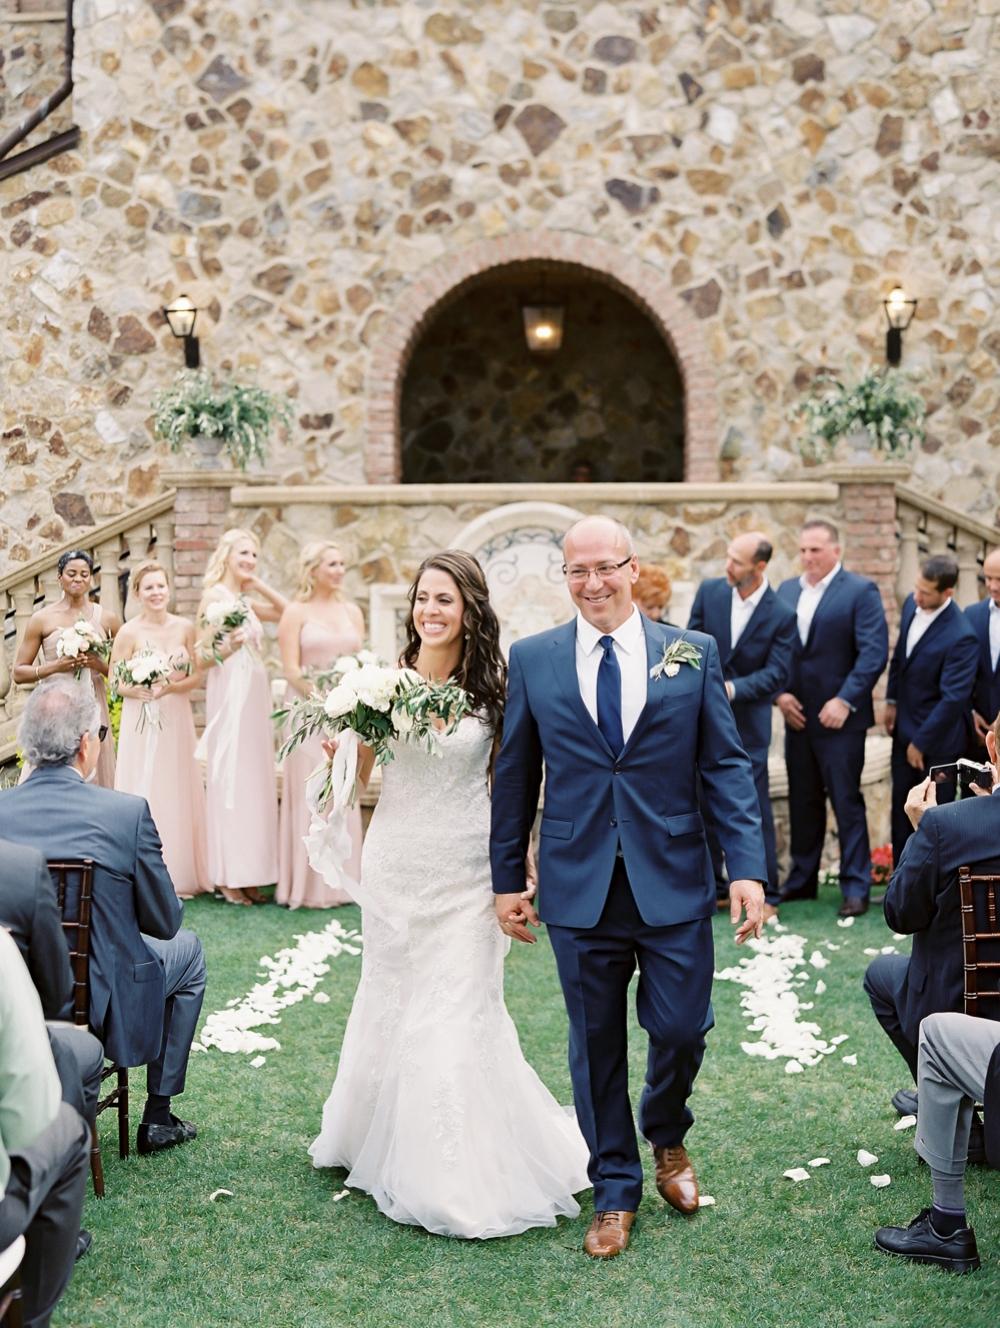 Vicki+Grafton+Photography+-+Fine+Art+Film+Wedding+Photographer+-+Bella+Collina+Wedding_0058.jpg